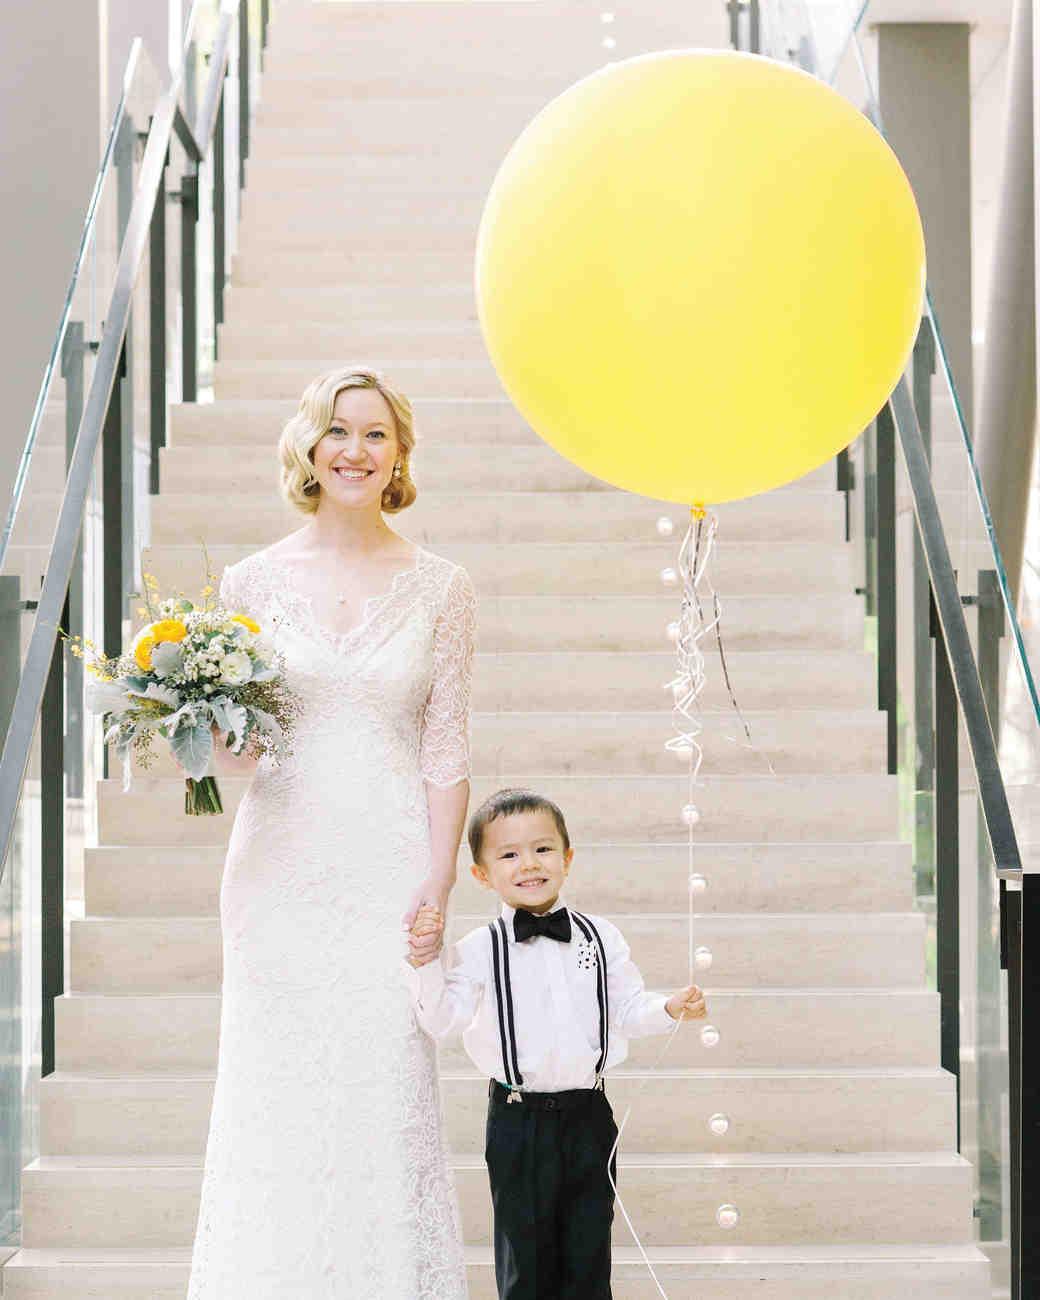 mamy-dan-wedding-canada-family-bride-and-ring-bearer-018-s112629.jpg